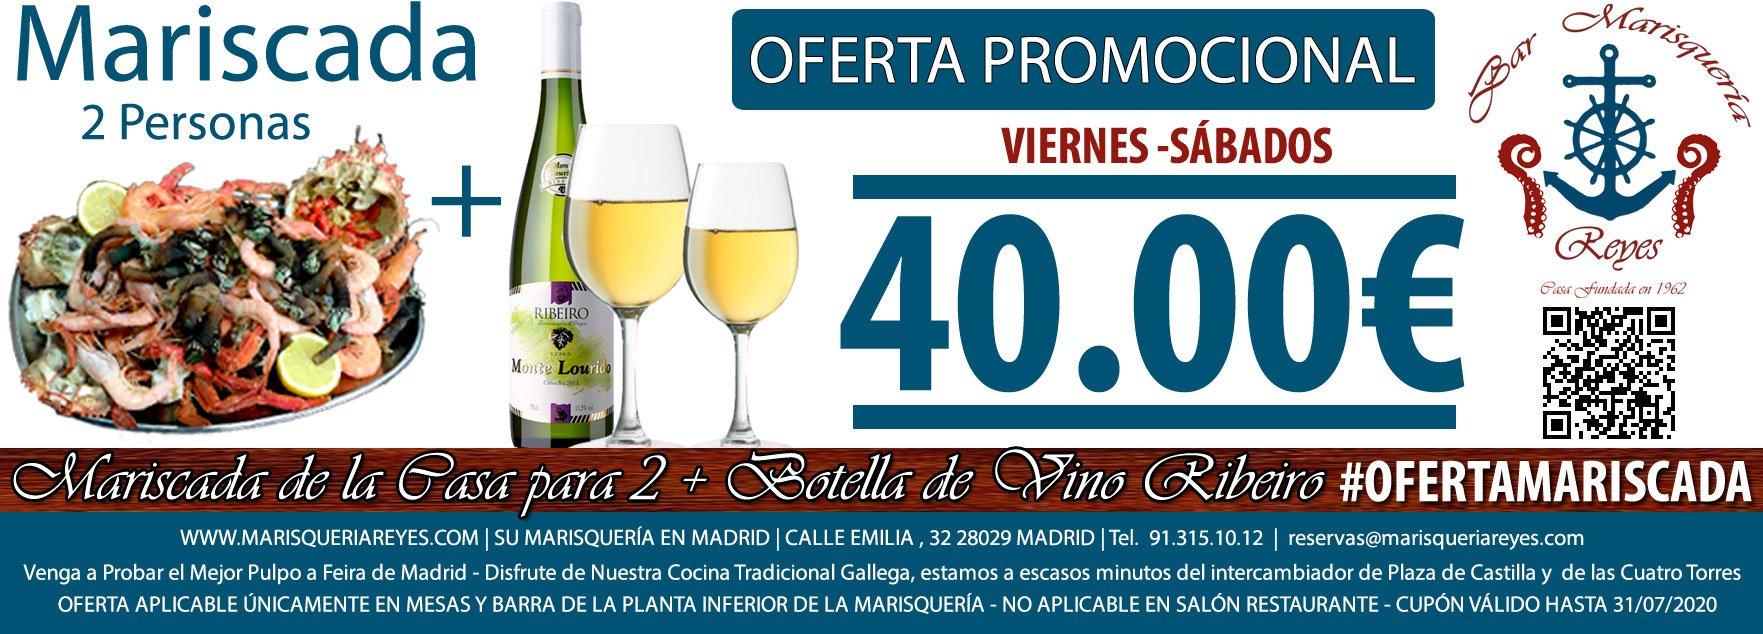 Promoción Mariscada Para 2 Personas + Botella de Ribeiro 40 € en Marisquería Reyes, Su Marisquería en Madrid